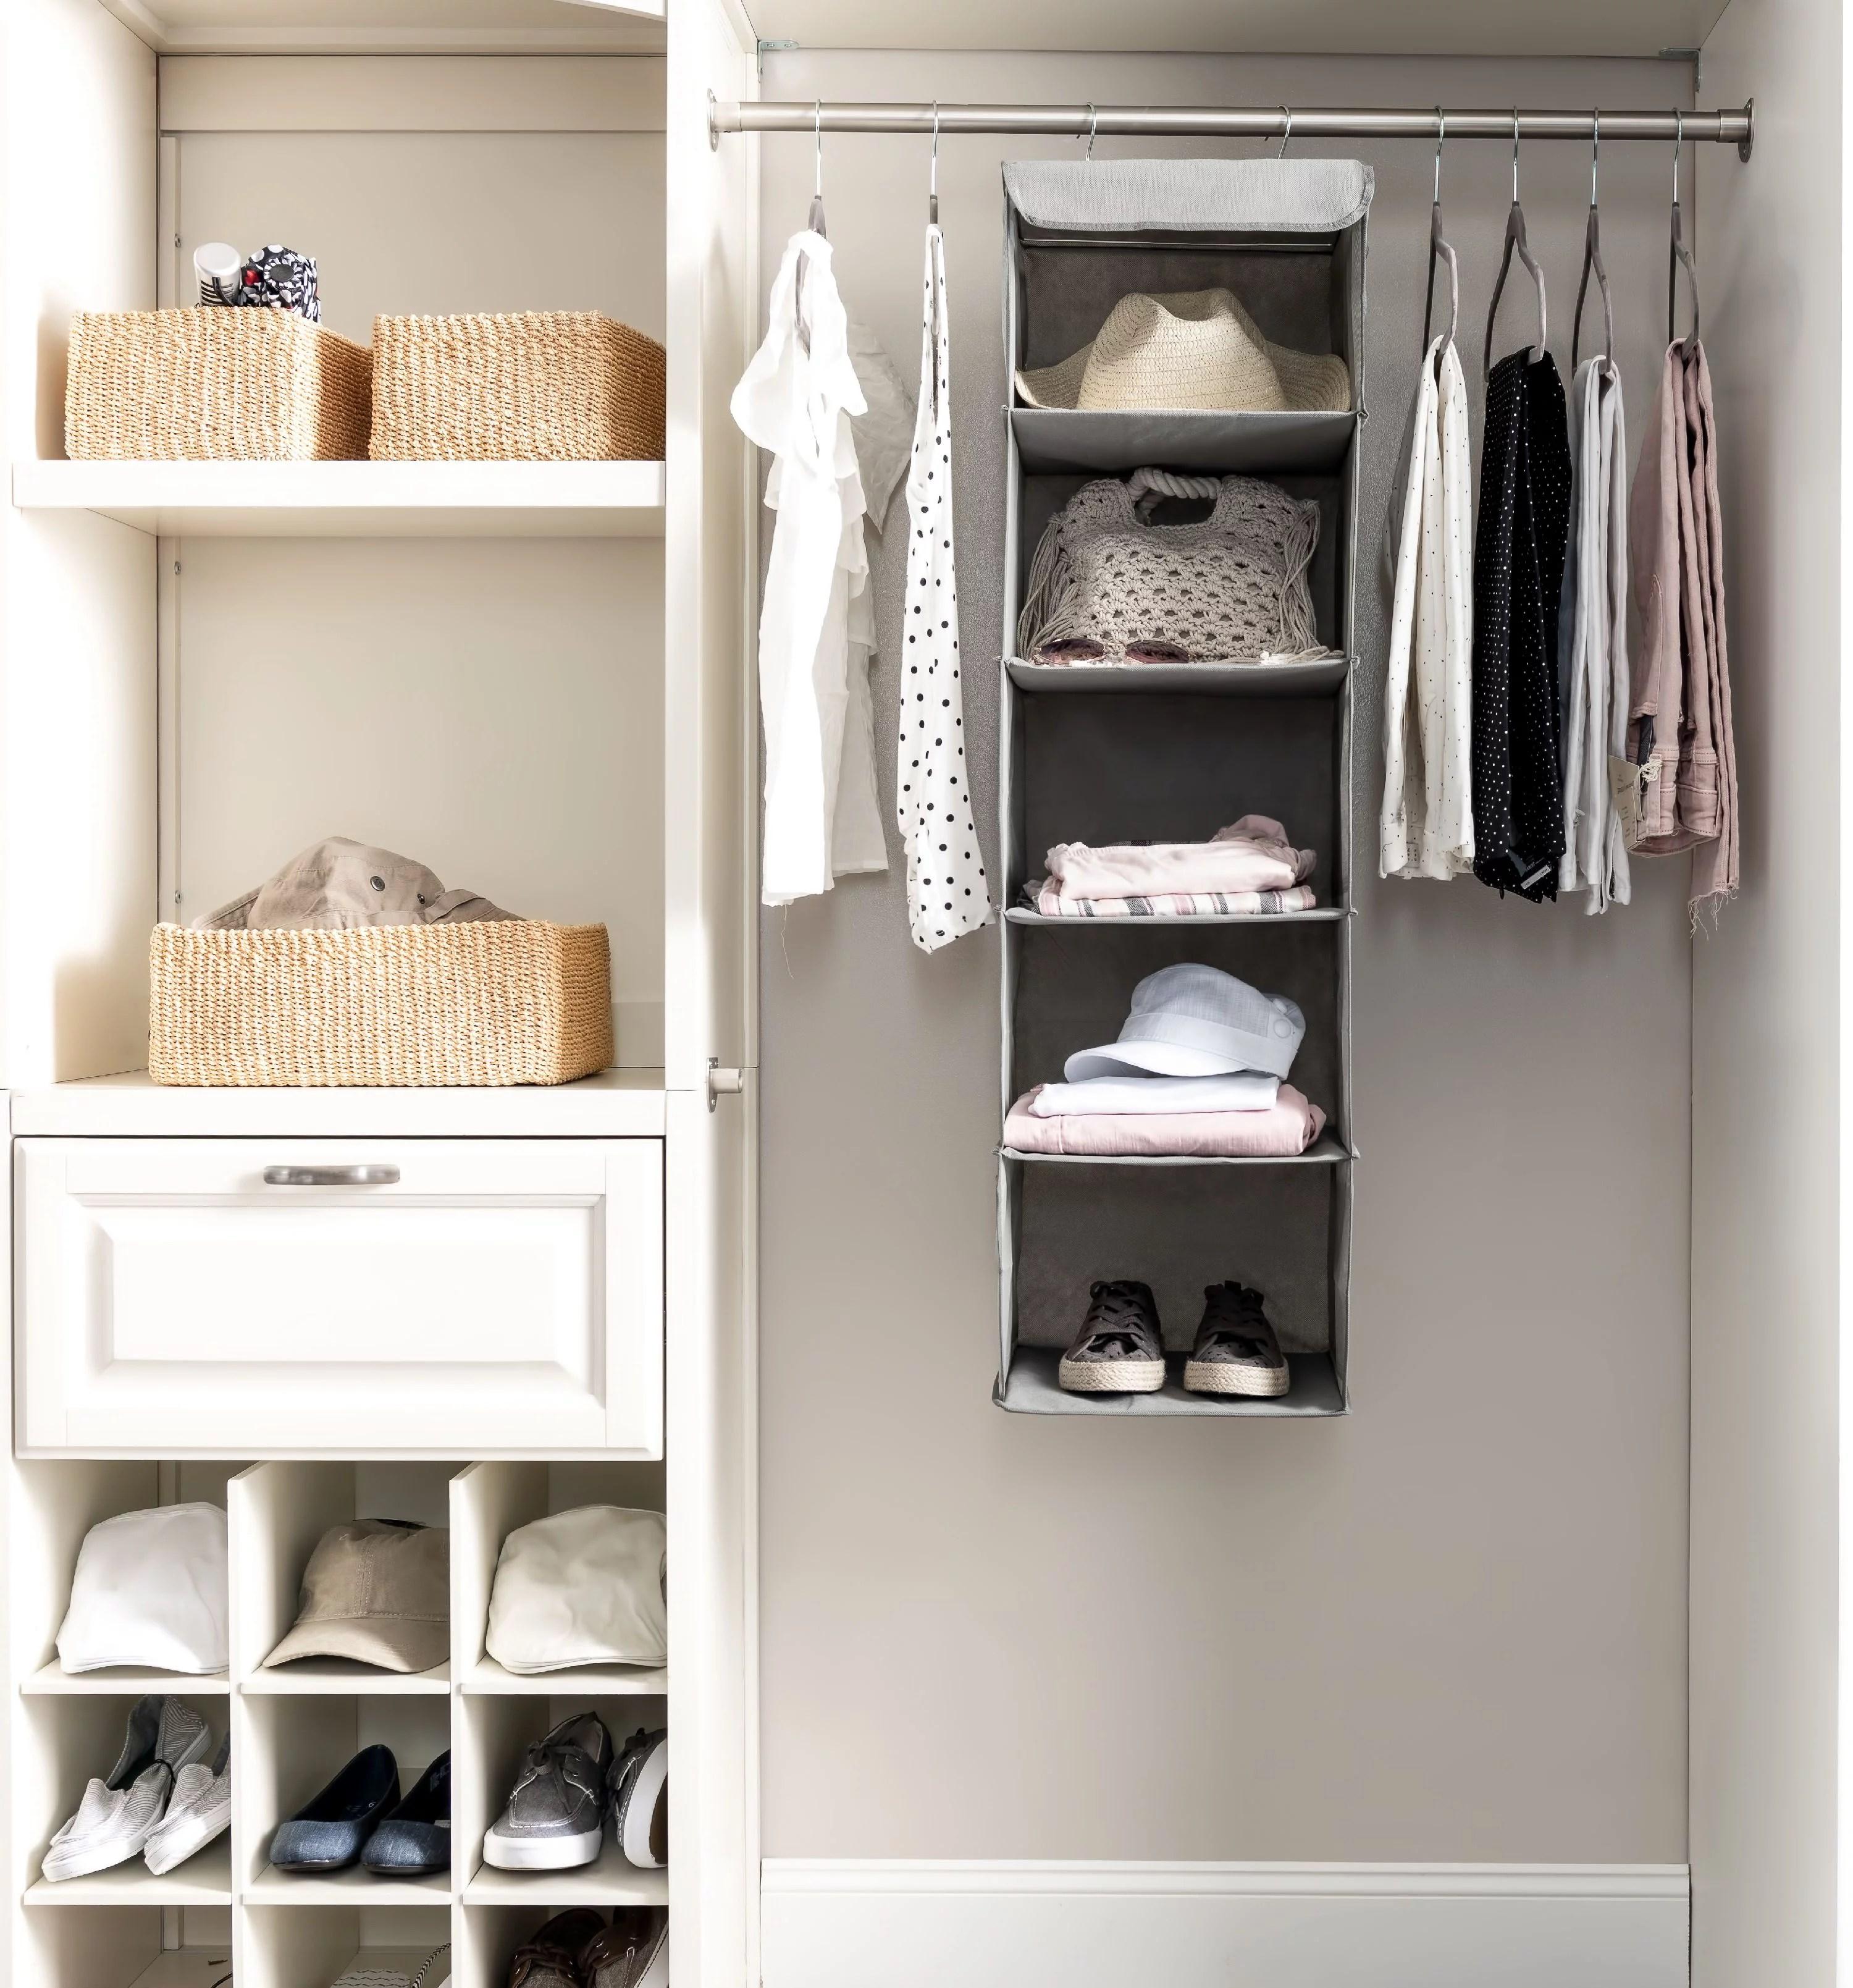 KosKano 5 Shelf Hanging Closet Organizer Space Saver ... on Closet Space Savers Walmart  id=39584